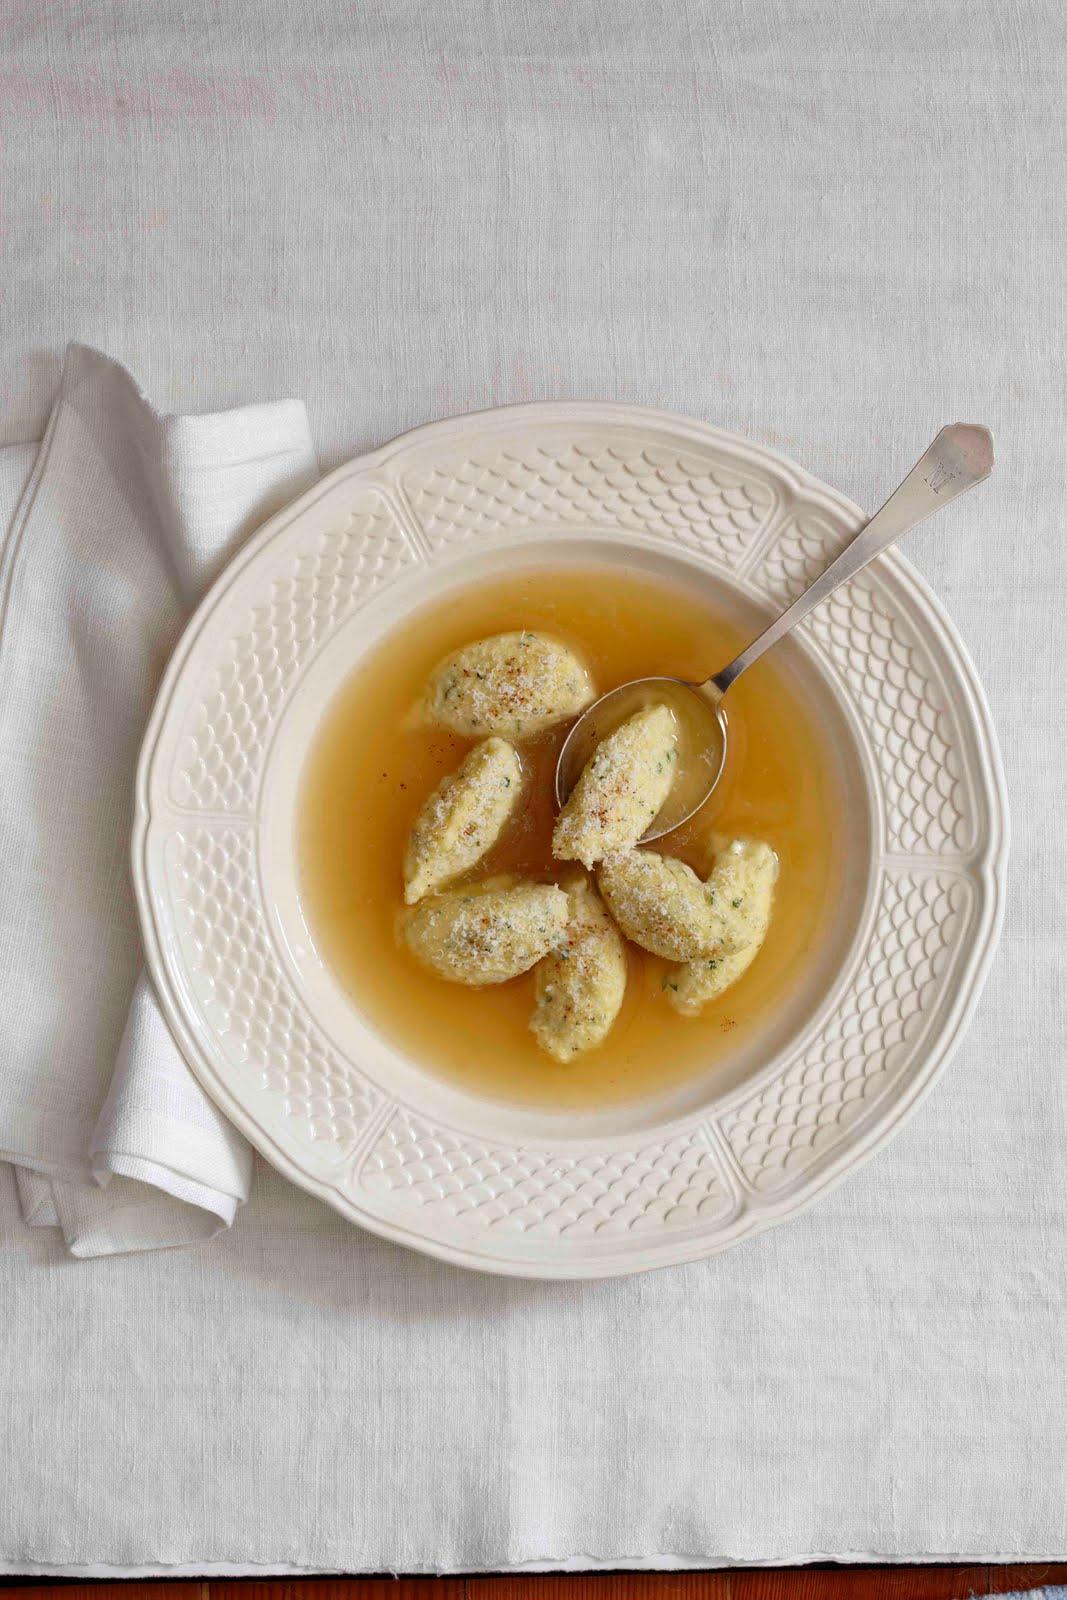 foodwanderings: Fluffy Semolina Dumpling Soup from Domenica Marchetti ...